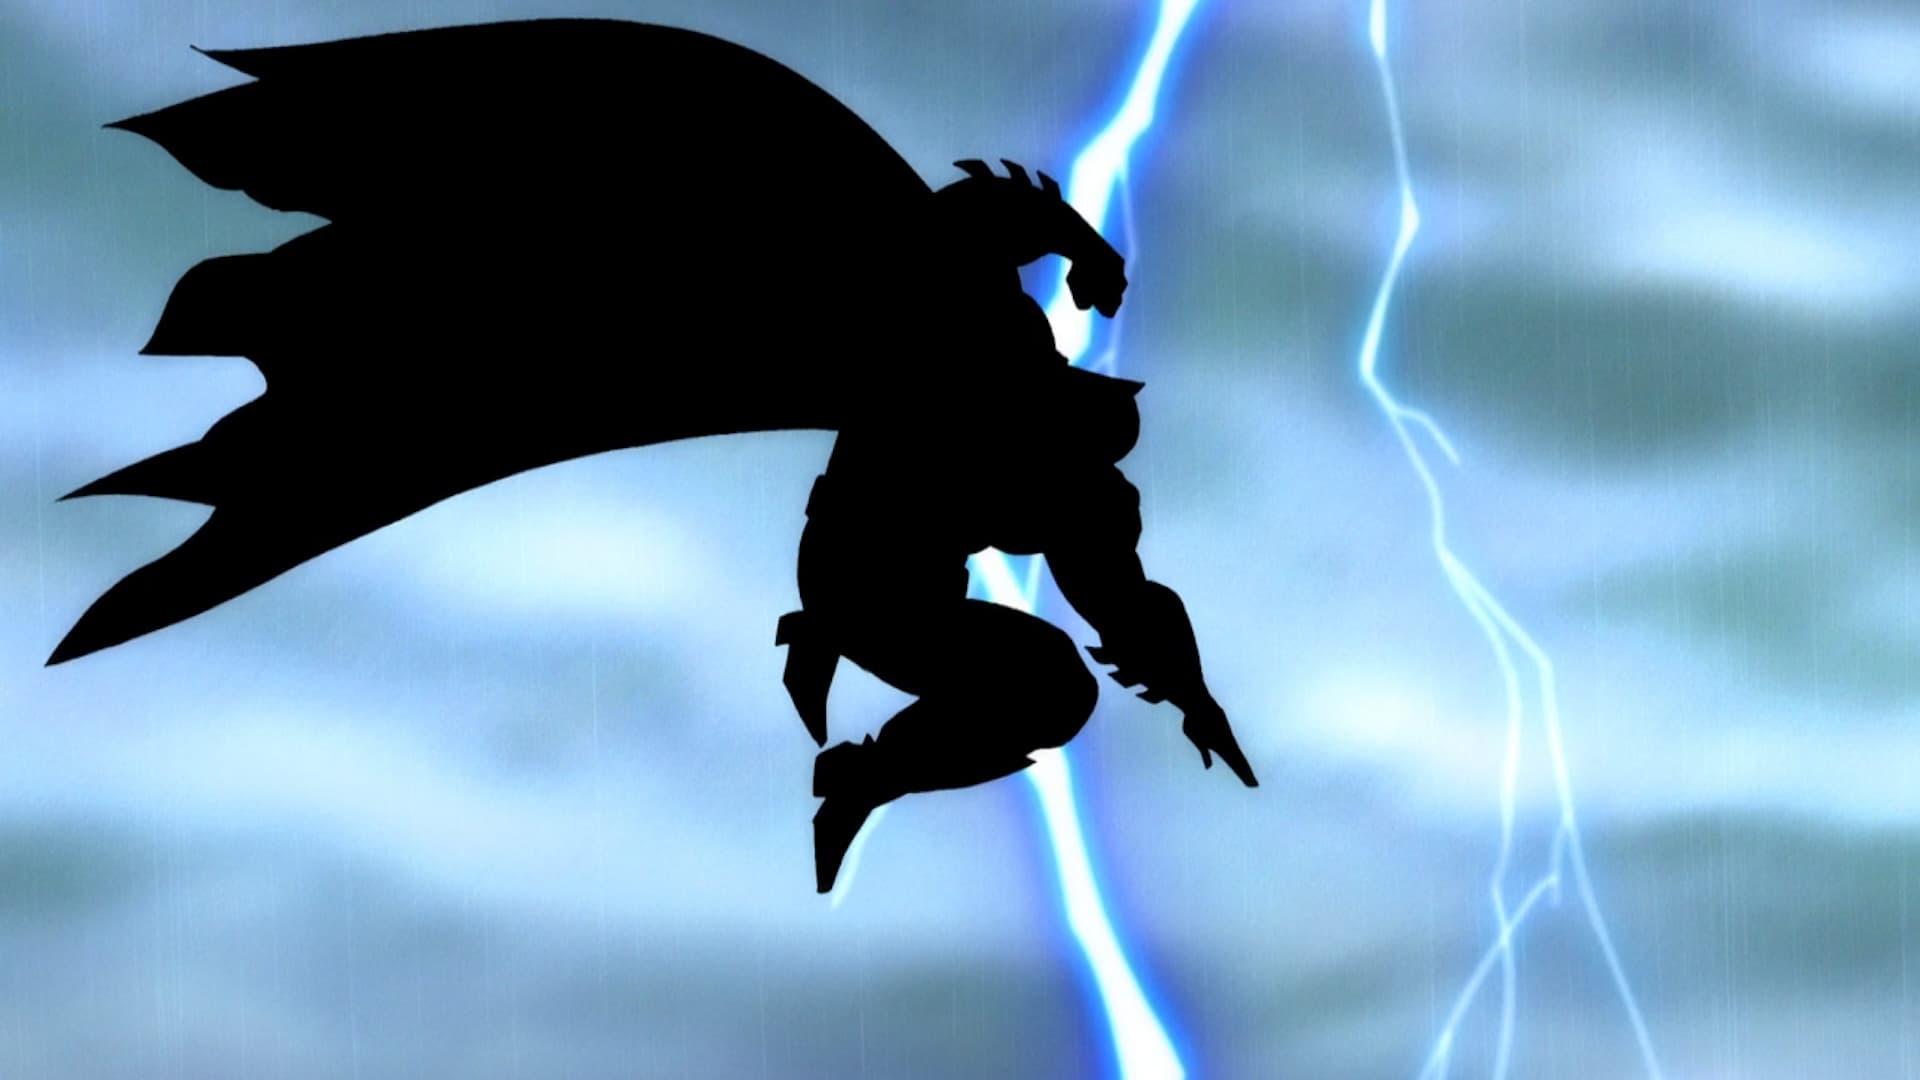 Regarder Batman: The Dark Knight Returns (Deluxe Edition) en streaming gratuit